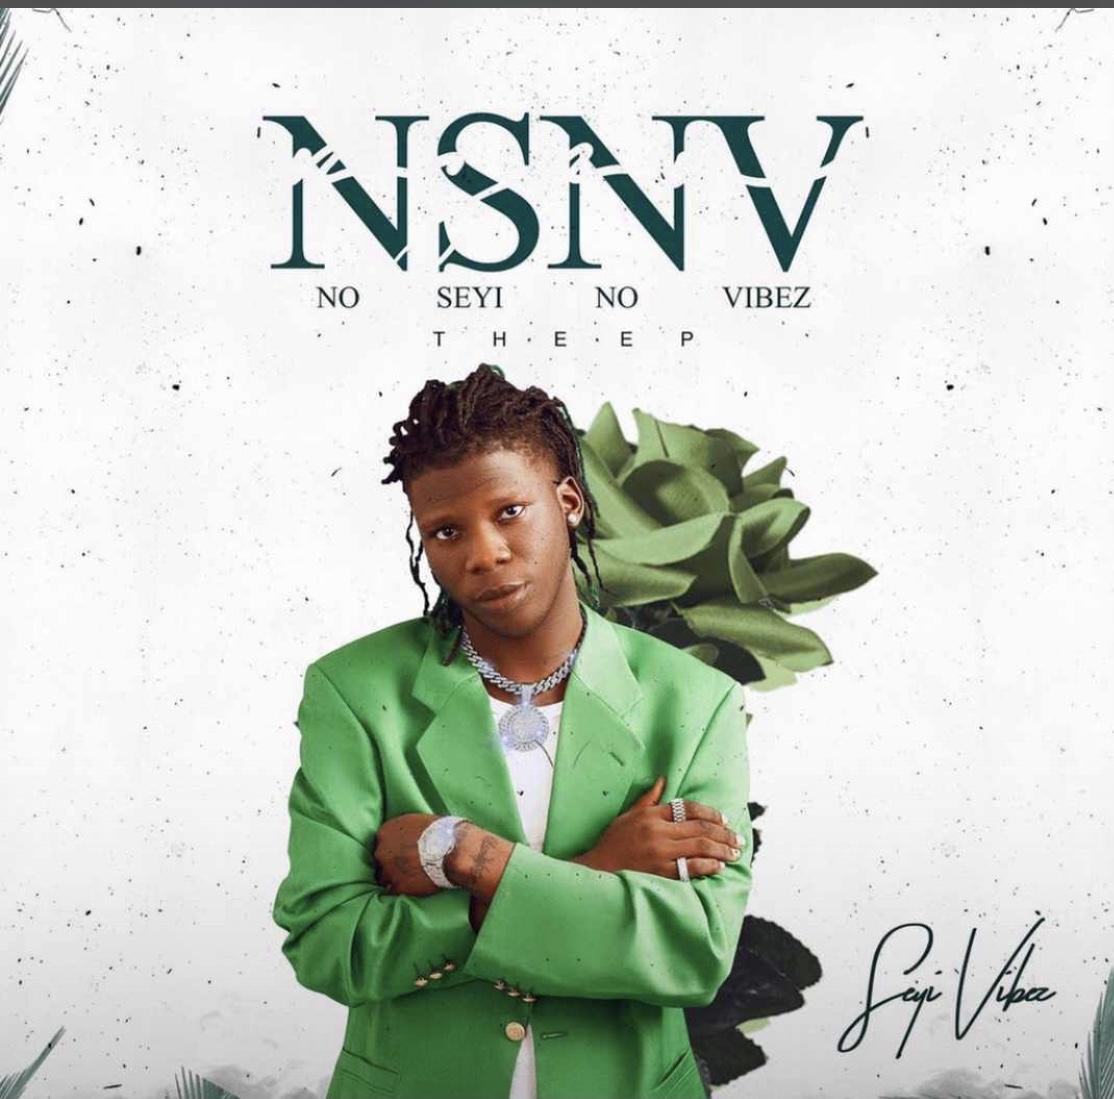 Seyi Vibez No Seyi No Vibez [NSNS] Full Ep Download artwork